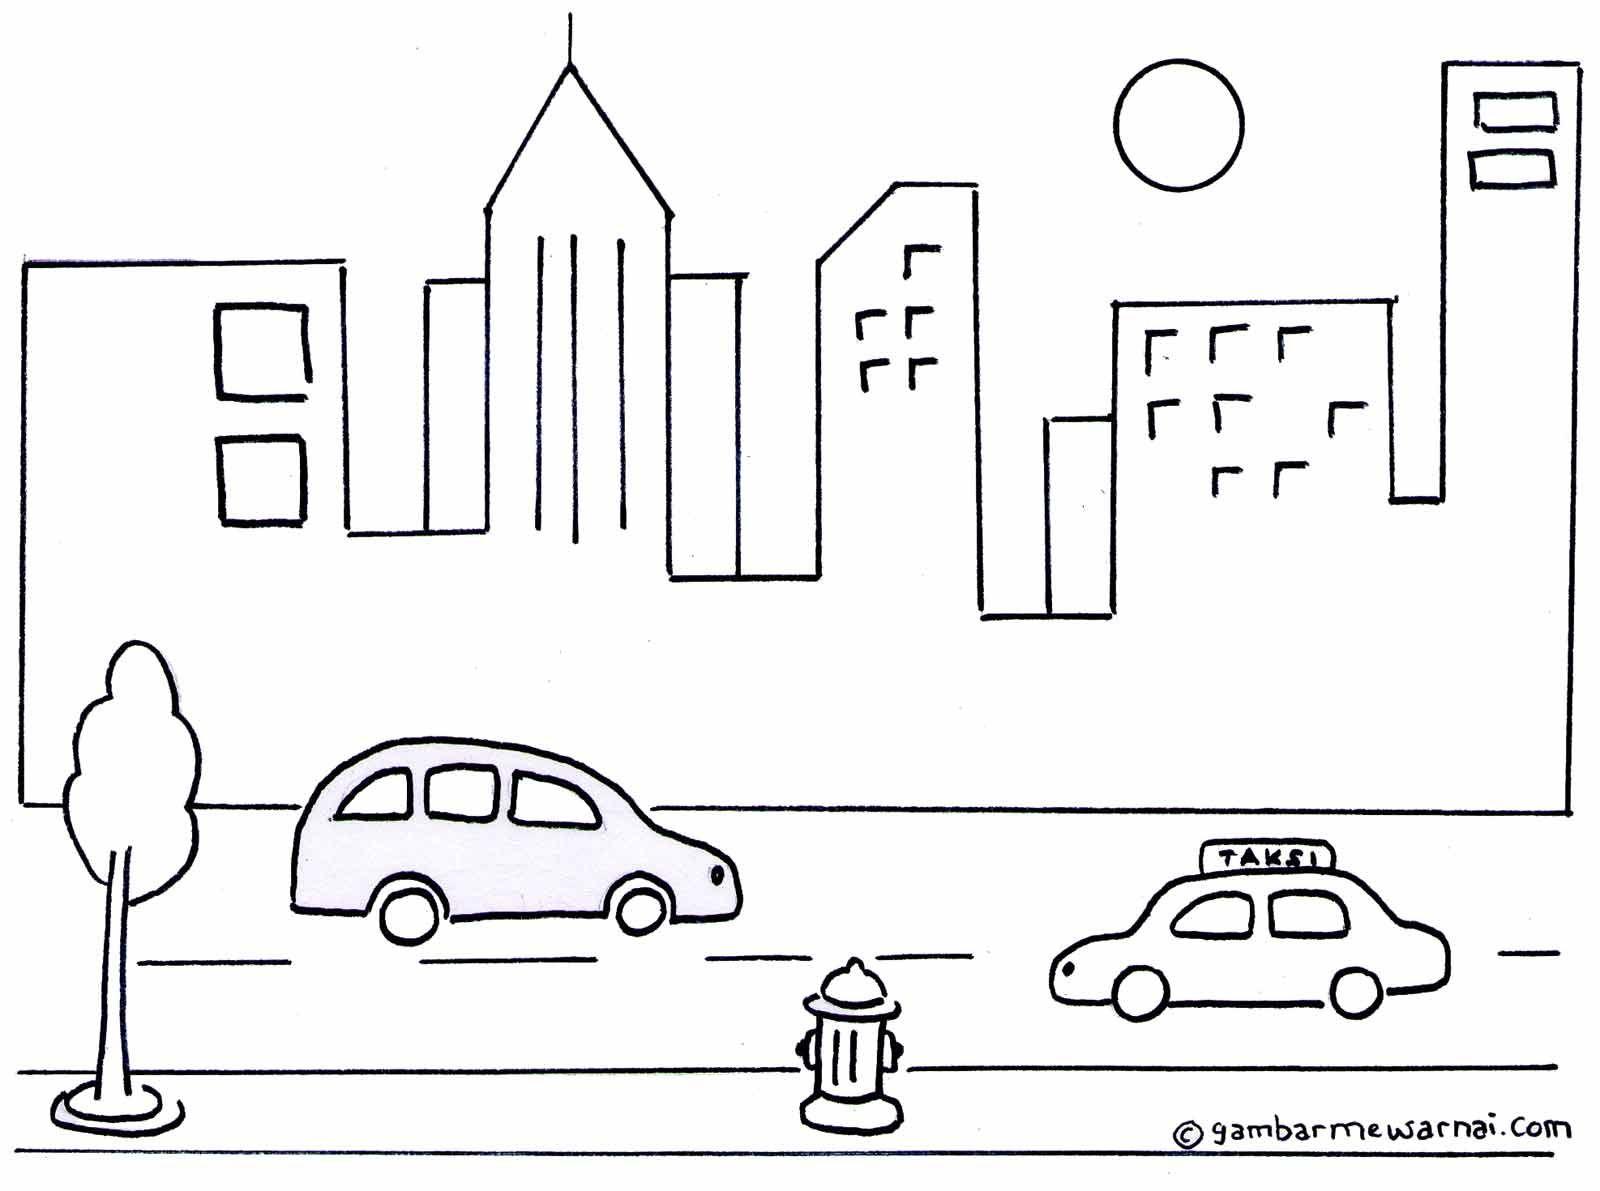 Terbaik 55+ Sketsa Contoh Gambar Kartun Yang Mudah Digambar Dan Berwarna